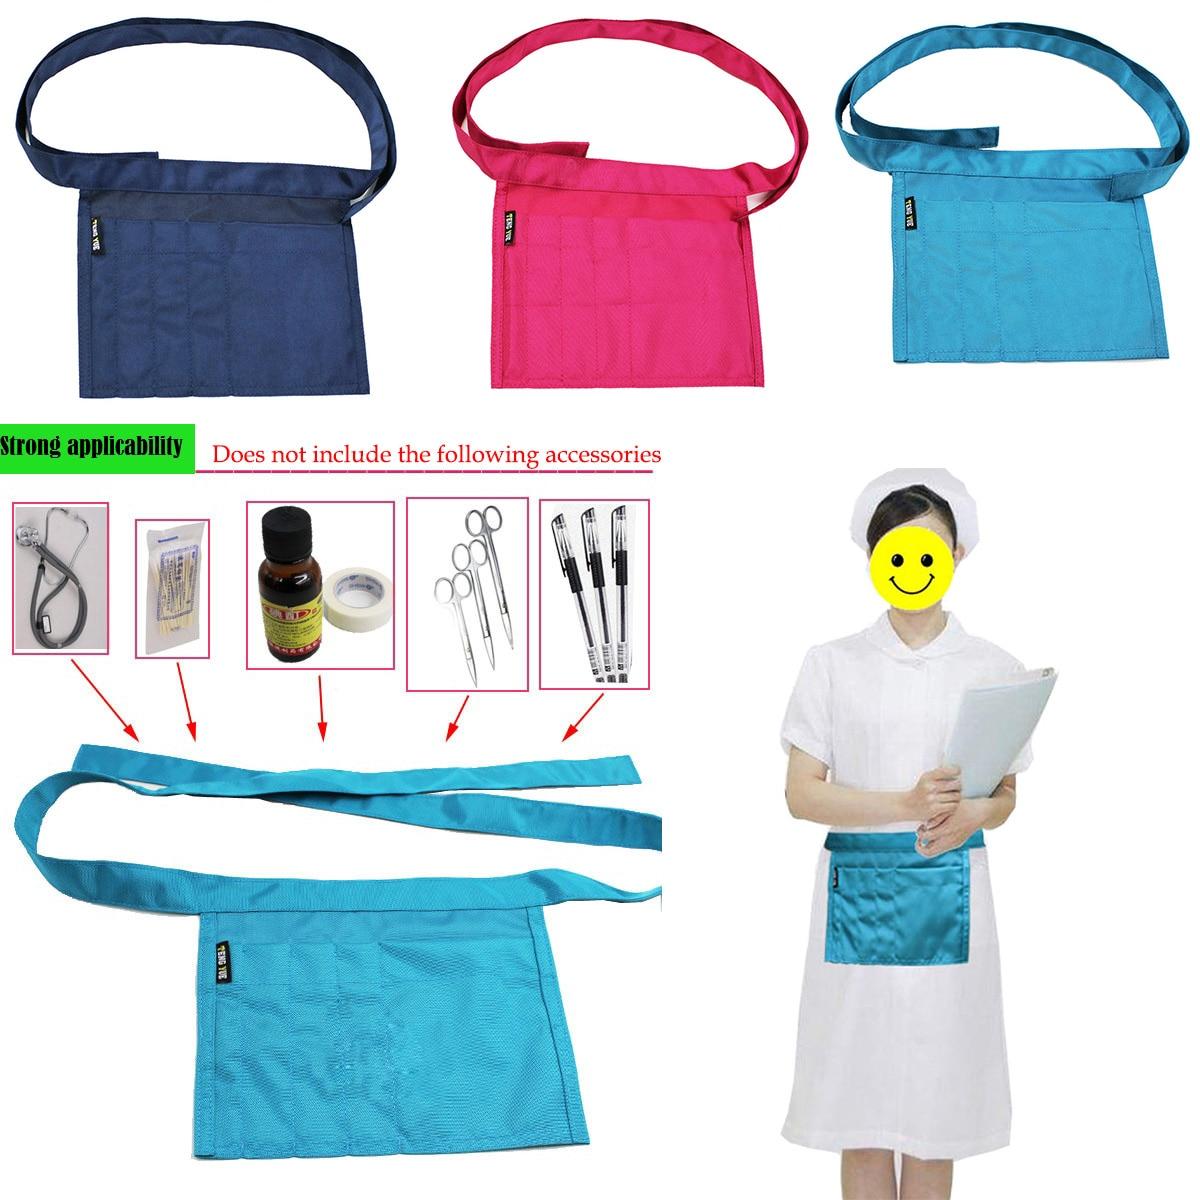 Nursing Fanny Pack Women Waist Belt Bag Shoulder Heuptas Pochete Hip Marsupio Donna Nurse Medical Tool Pouch Heuptasje Pocket